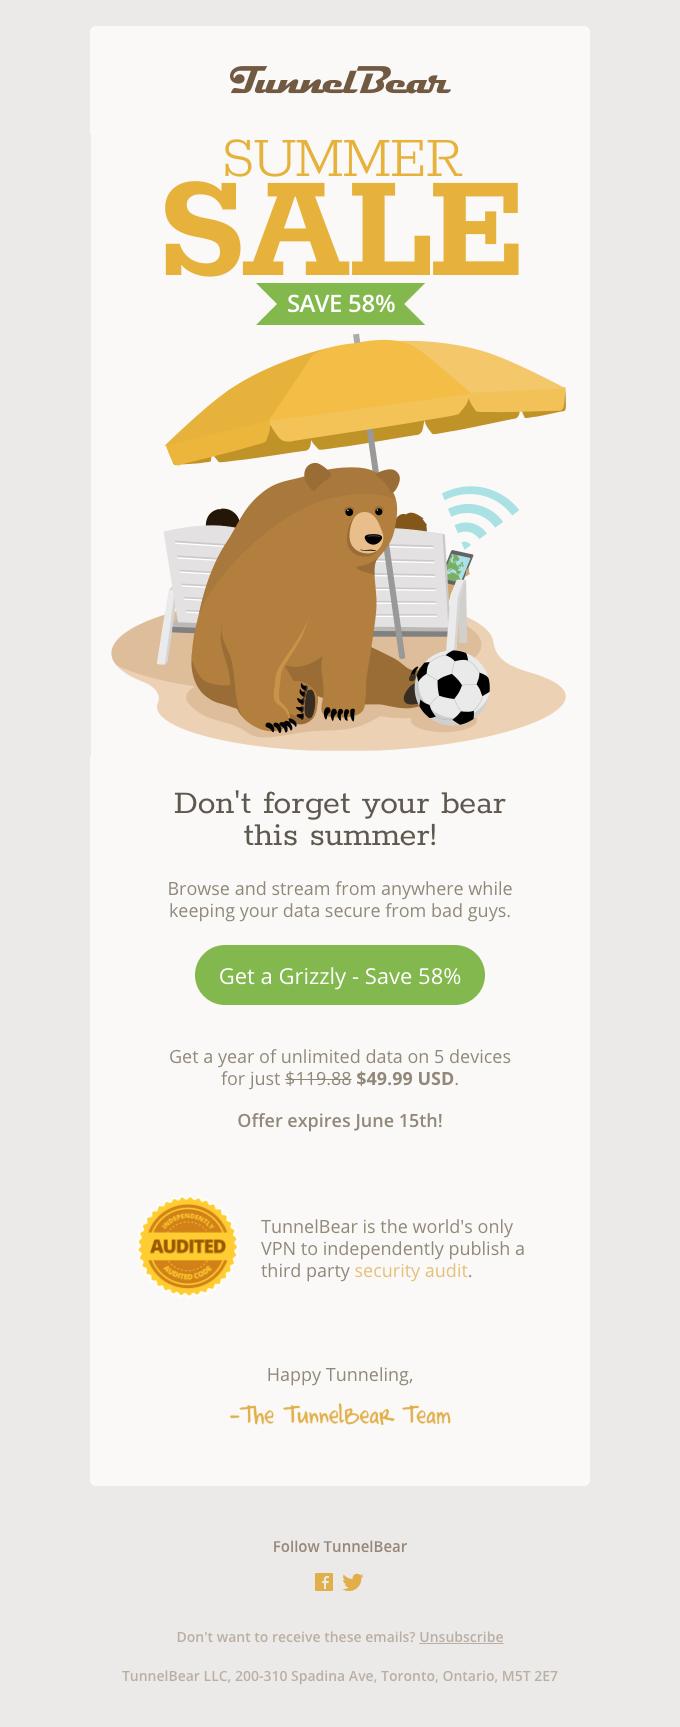 TunnelBear Summer Sale – Save 58%